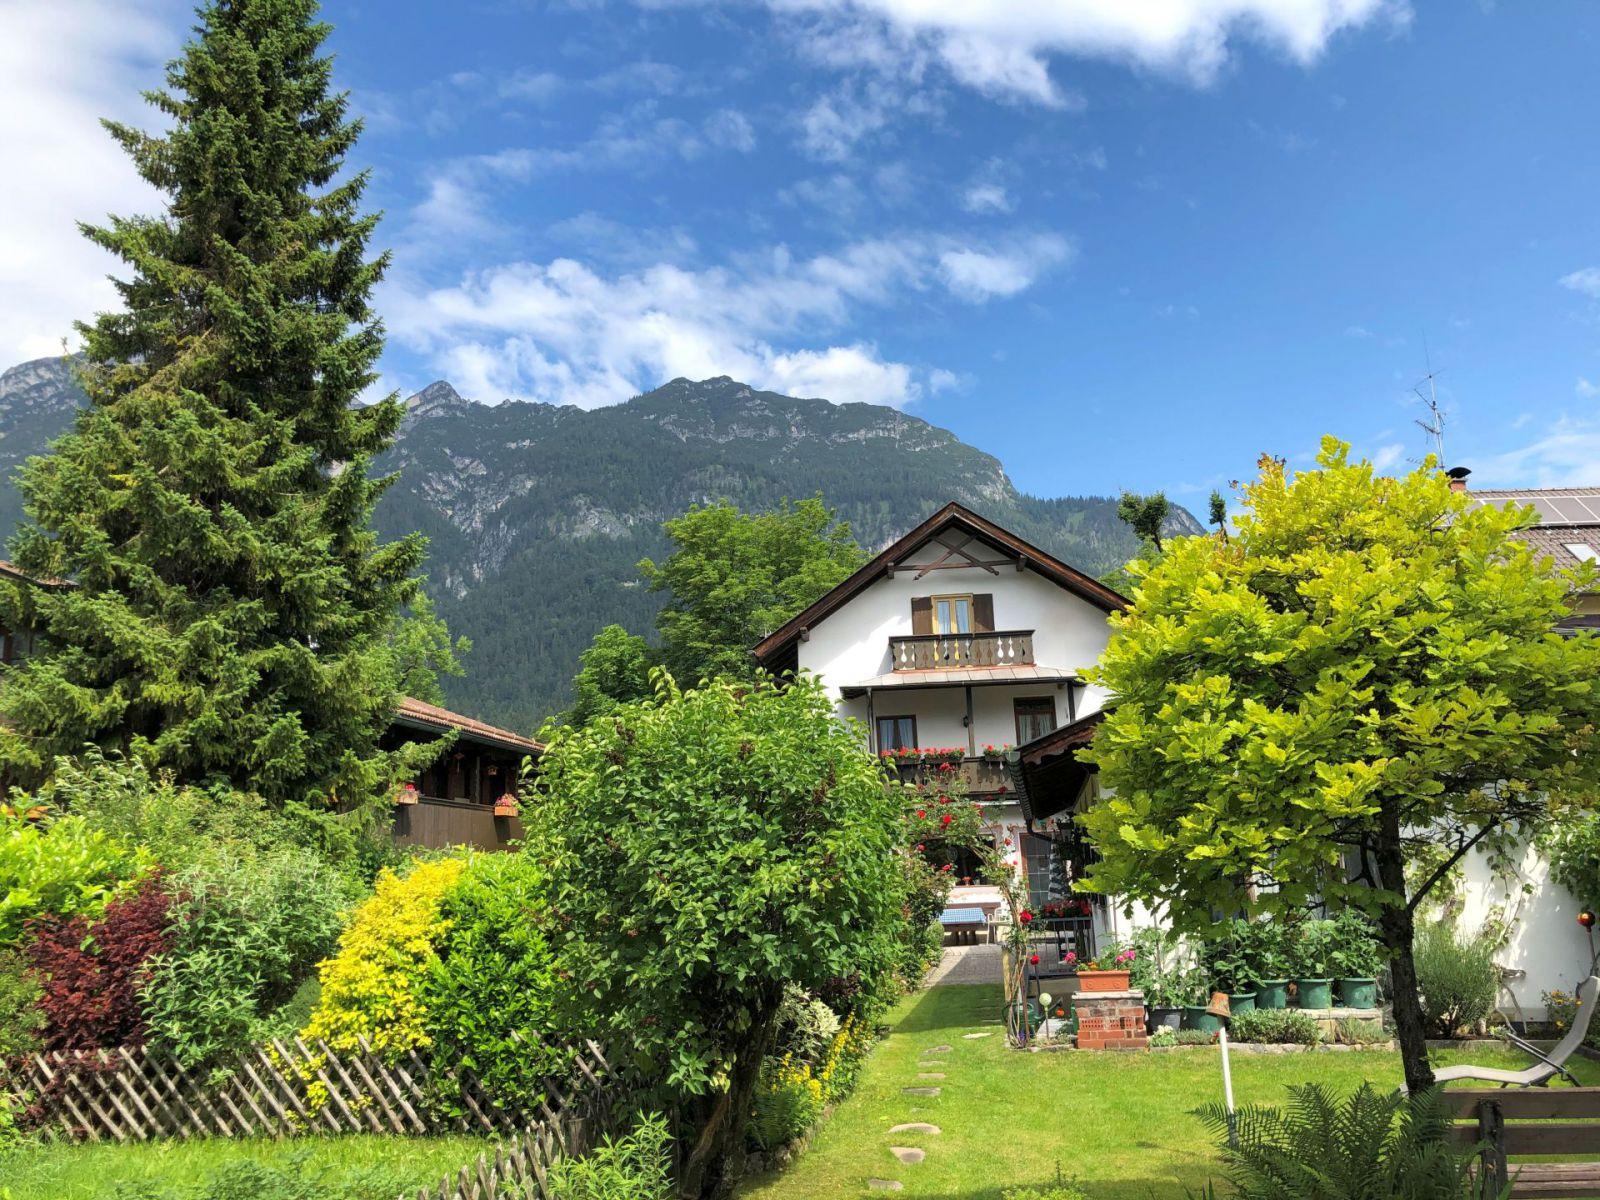 Haus-Sommer-EM-Gemuesegarten-2020